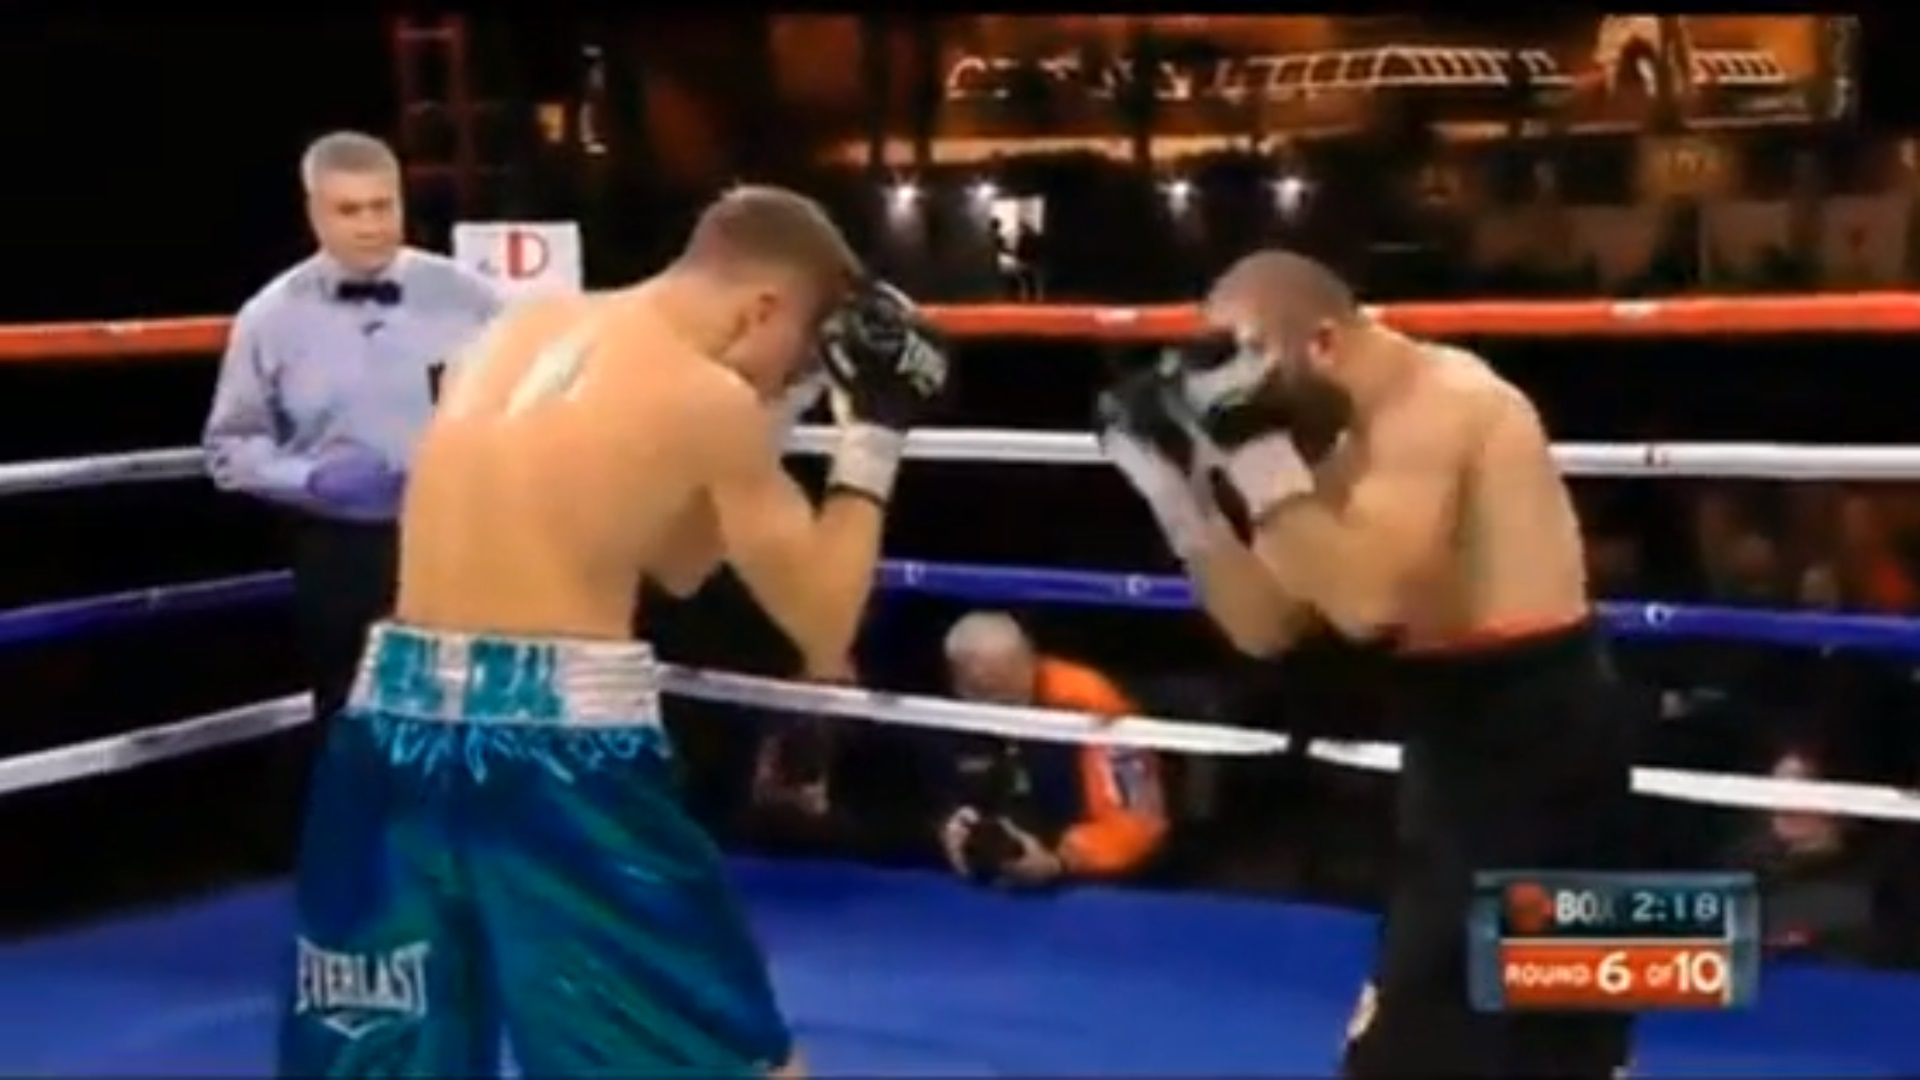 БРАВО! Украинский боксер Тарас Шелестюк победил россиянина Козаева (ВИДЕО БОЯ)